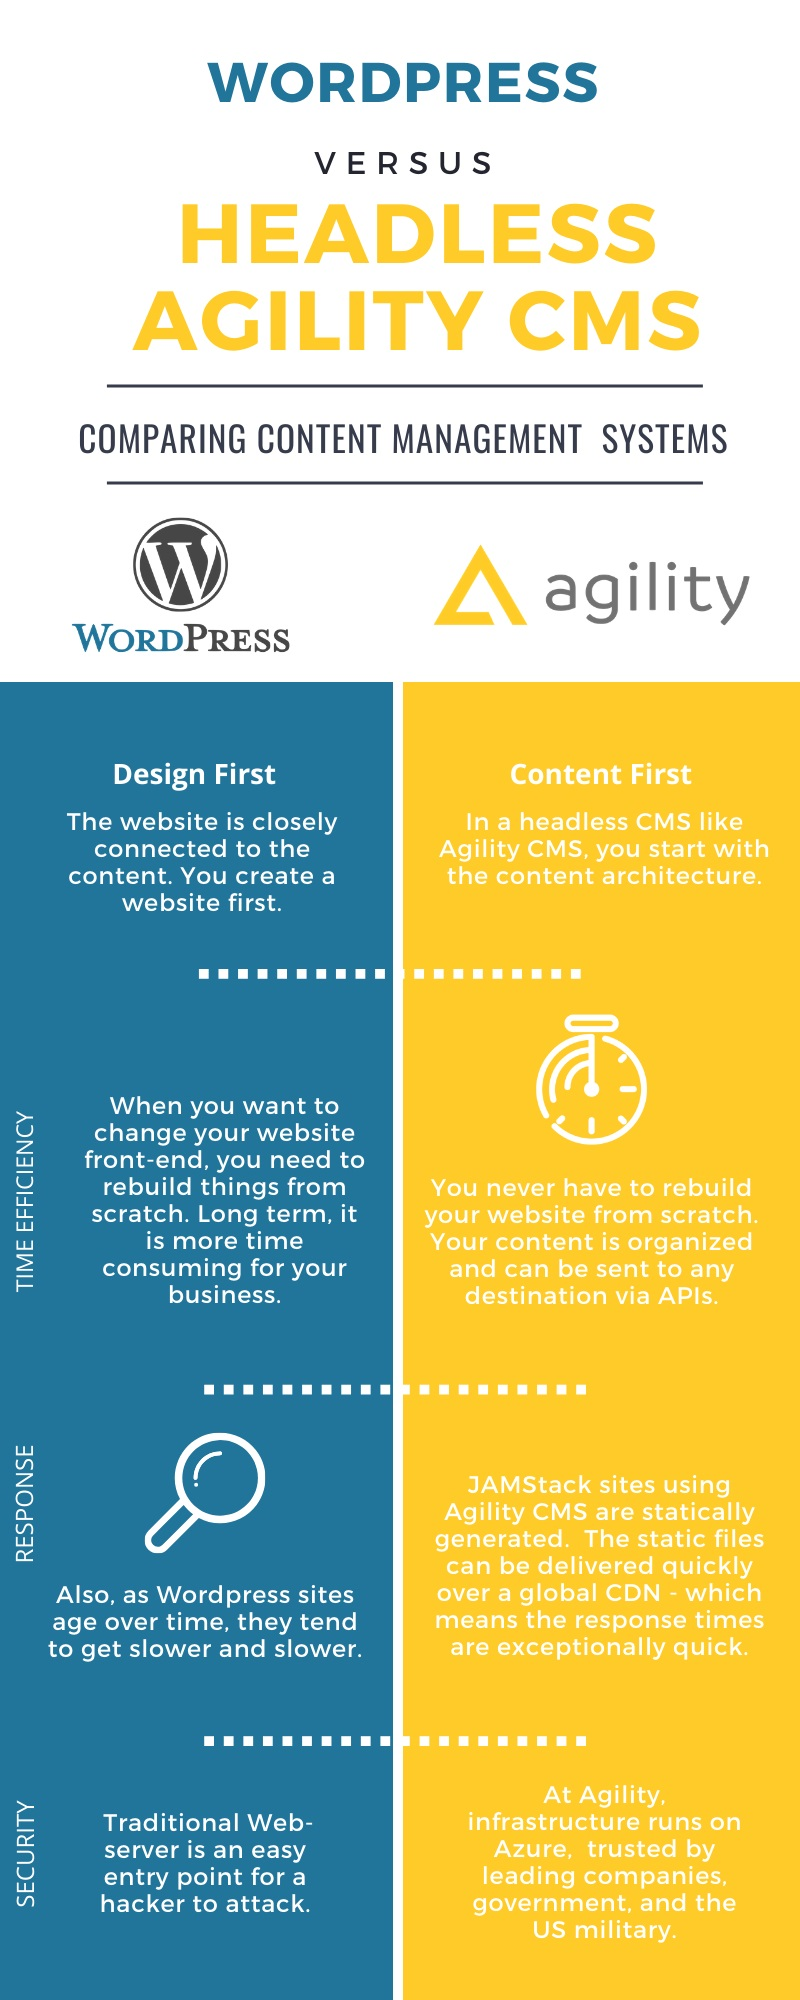 Wordpress vs Agility CMS